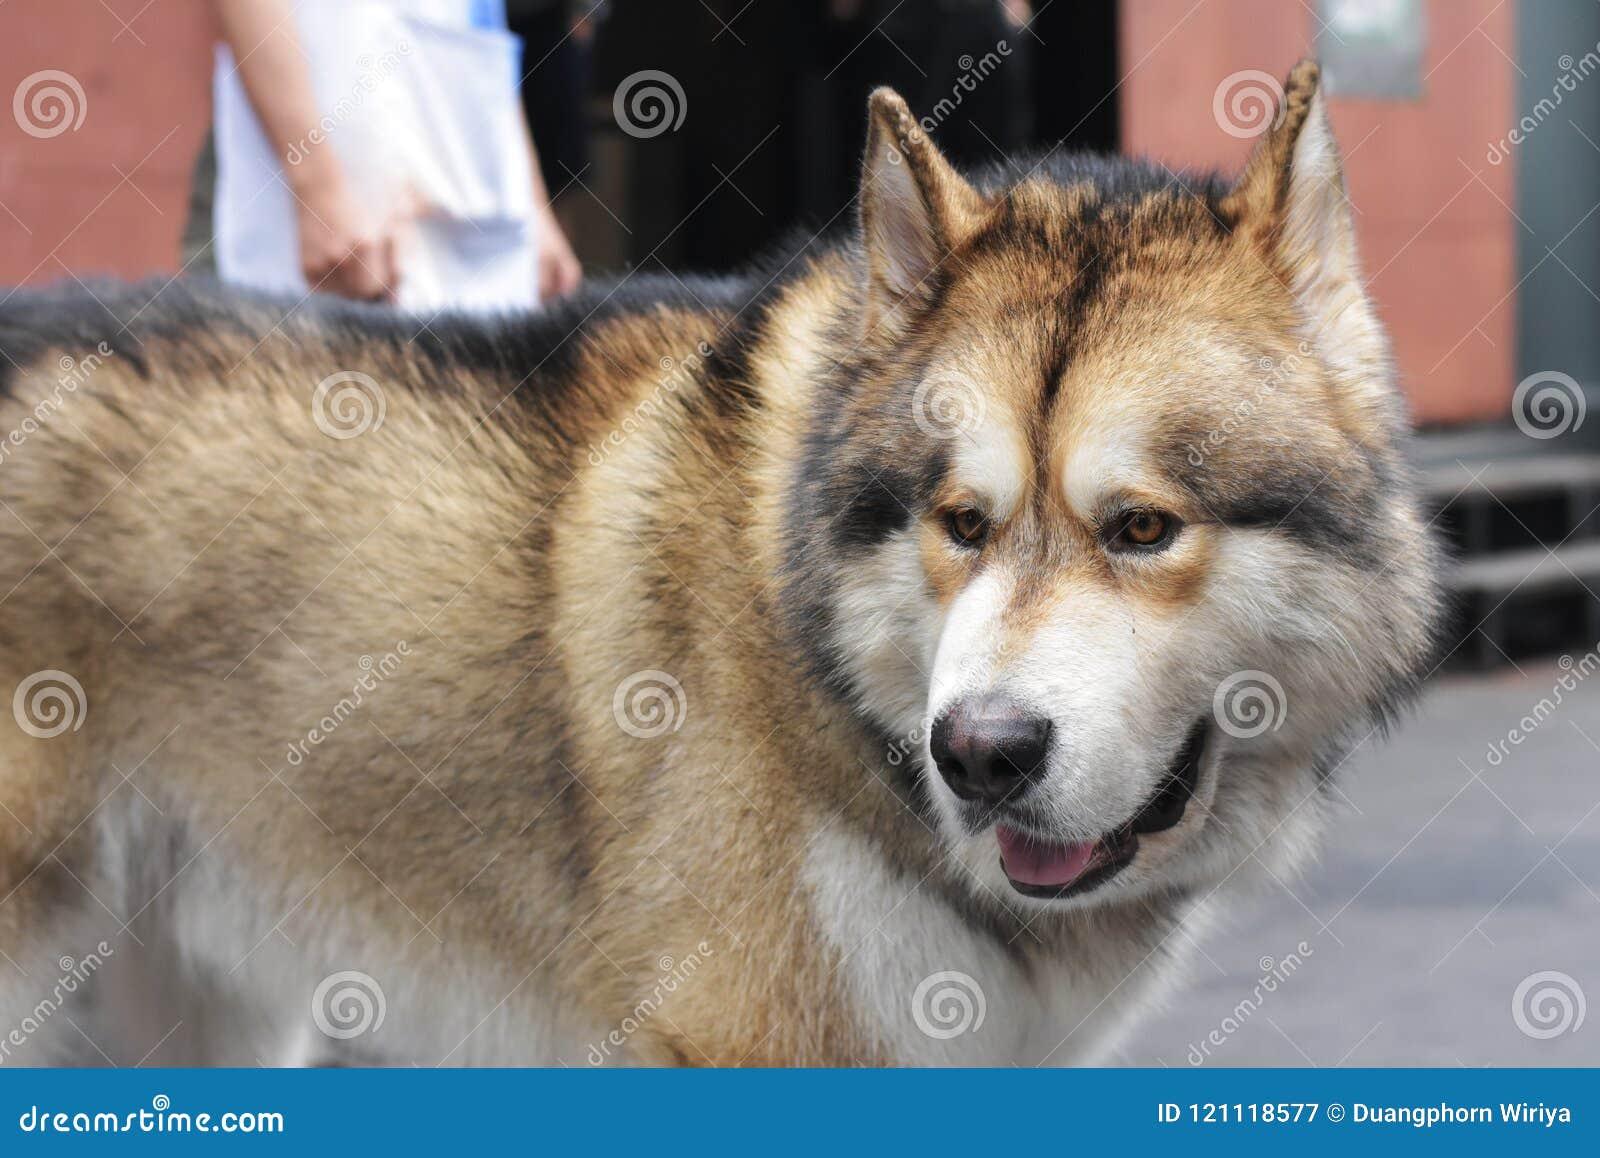 A Fat Siberian Husky Stock Image Image Of Wildlife 121118577